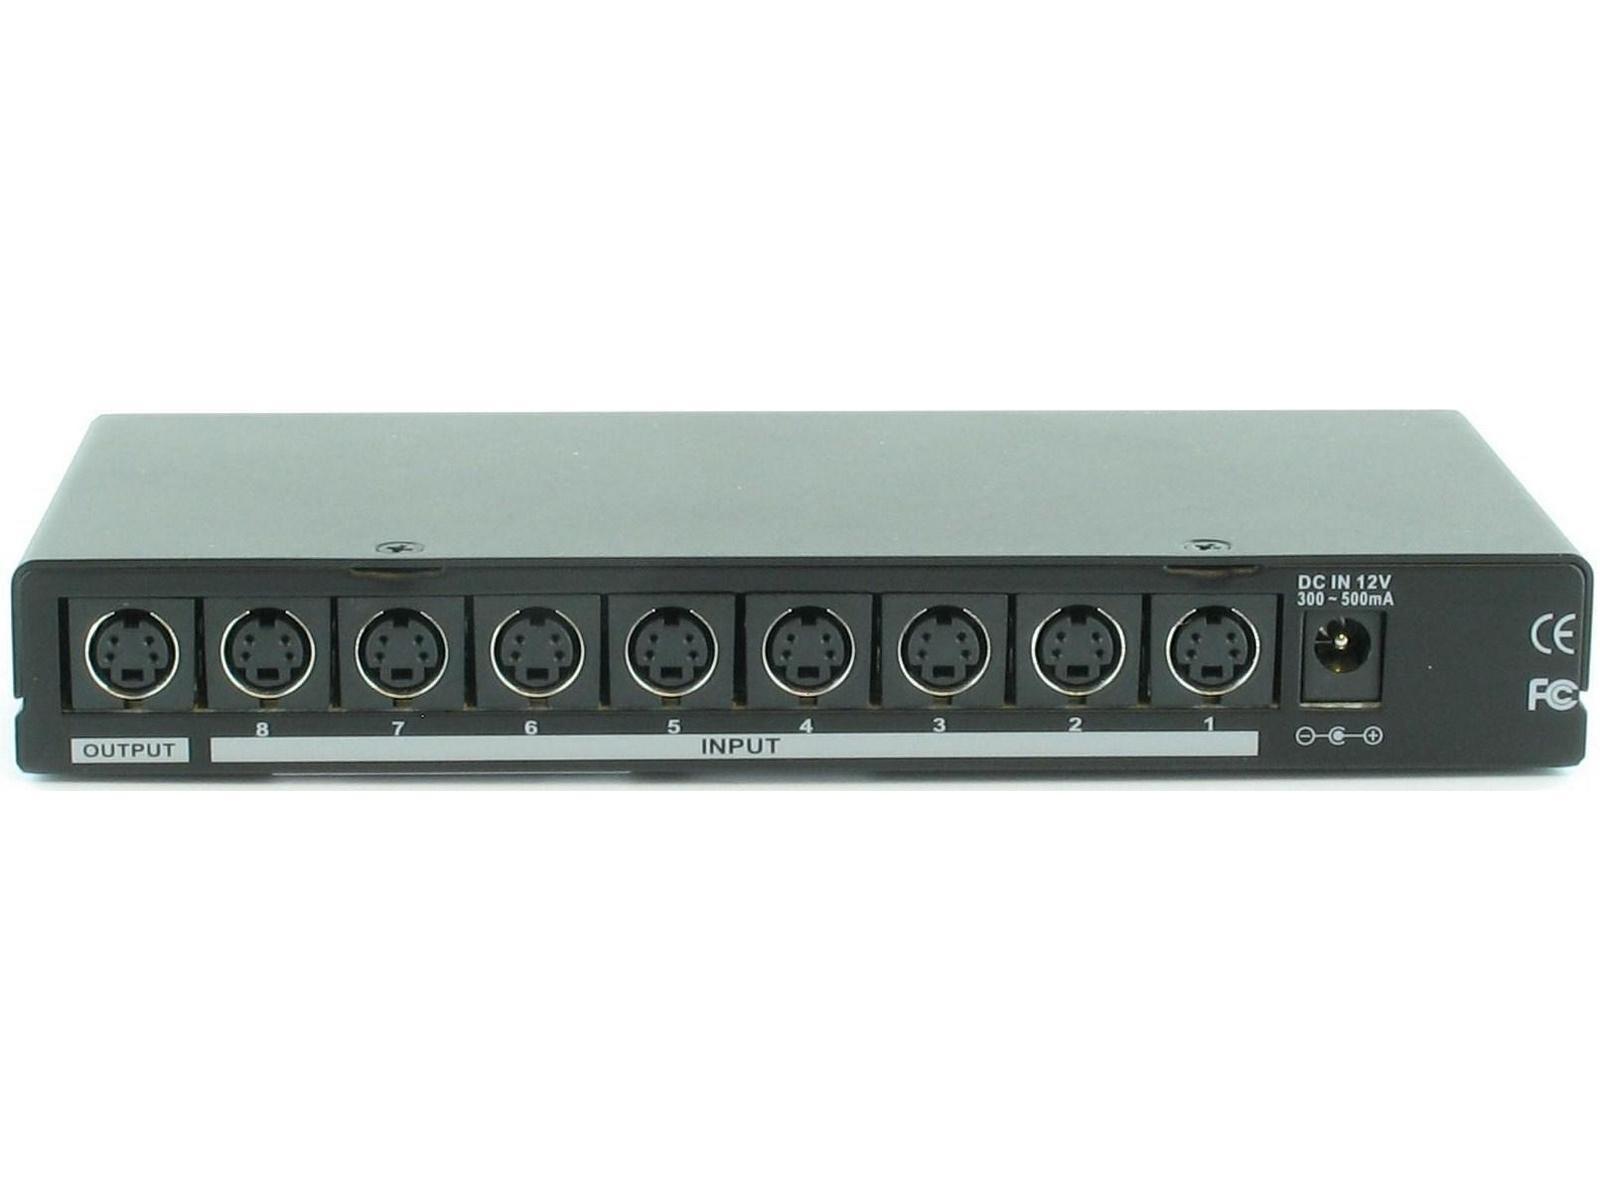 SB-5440SV 8x1 S-Video Switcher by Shinybow